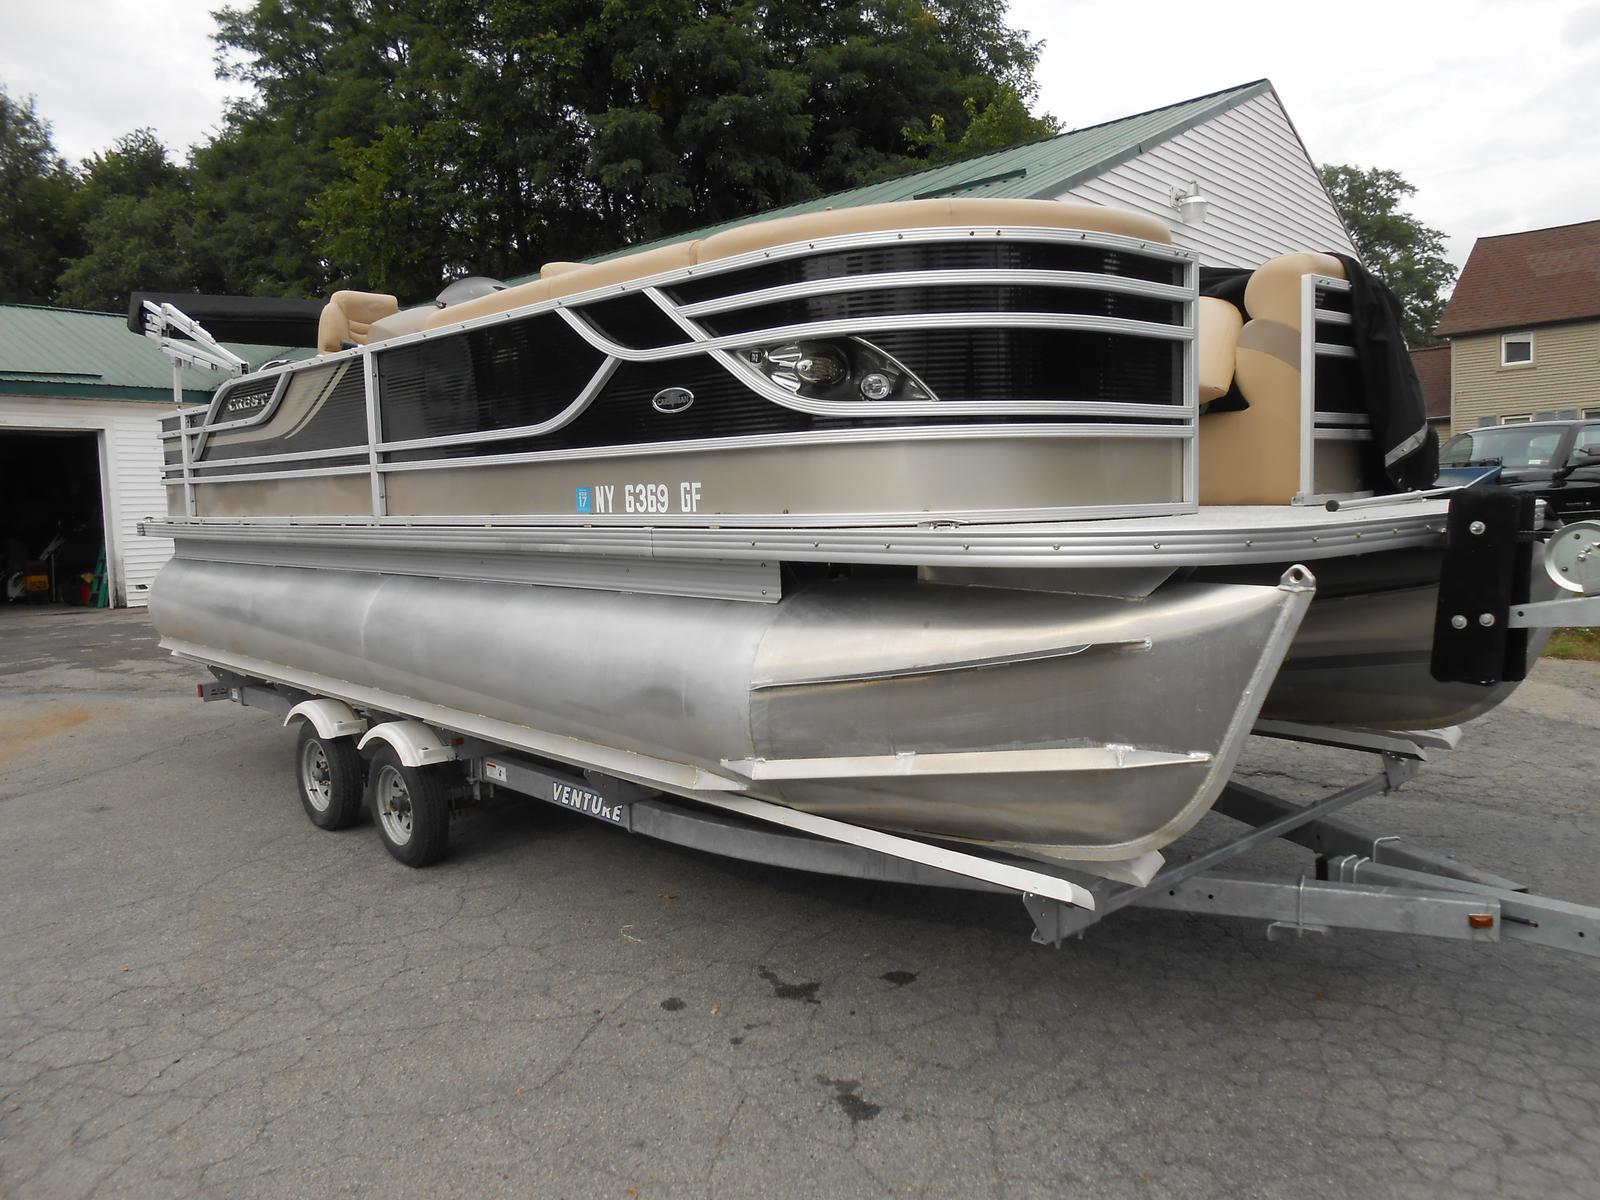 Used Pontoon Crest boats for sale - 3 - boats.com